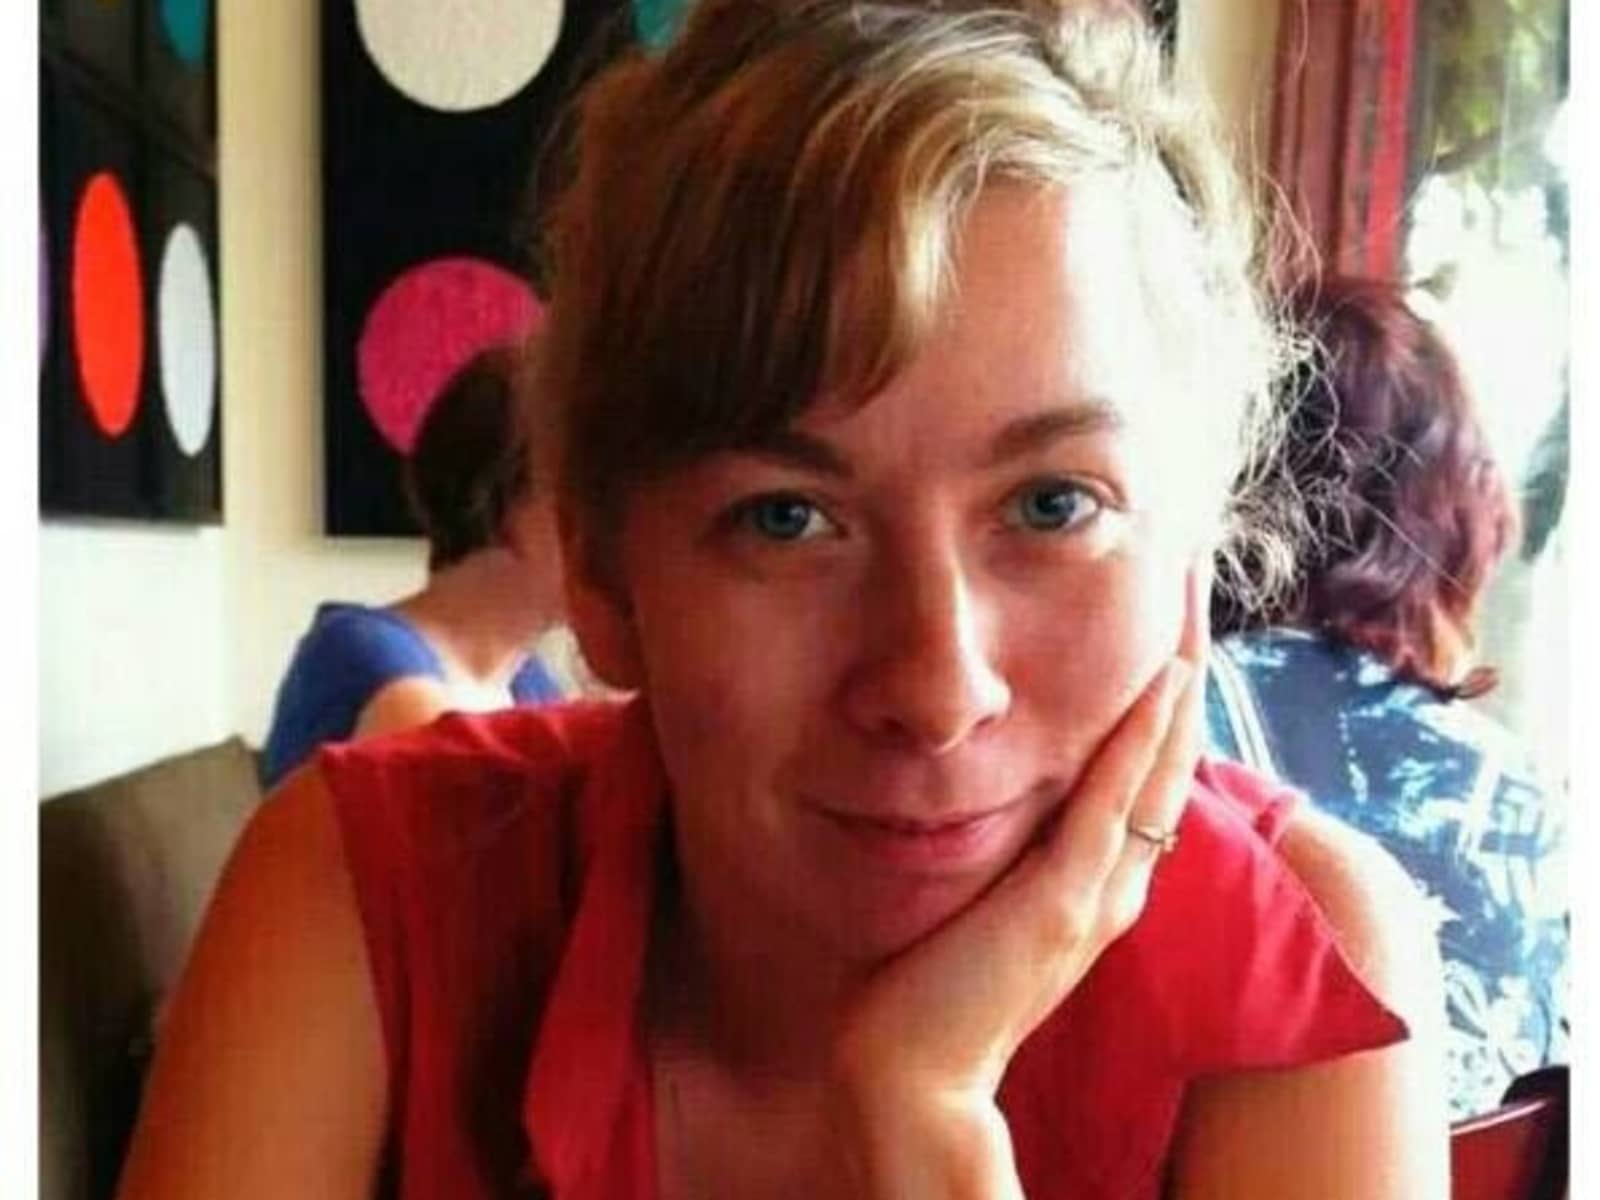 Samantha from Victoria, British Columbia, Canada